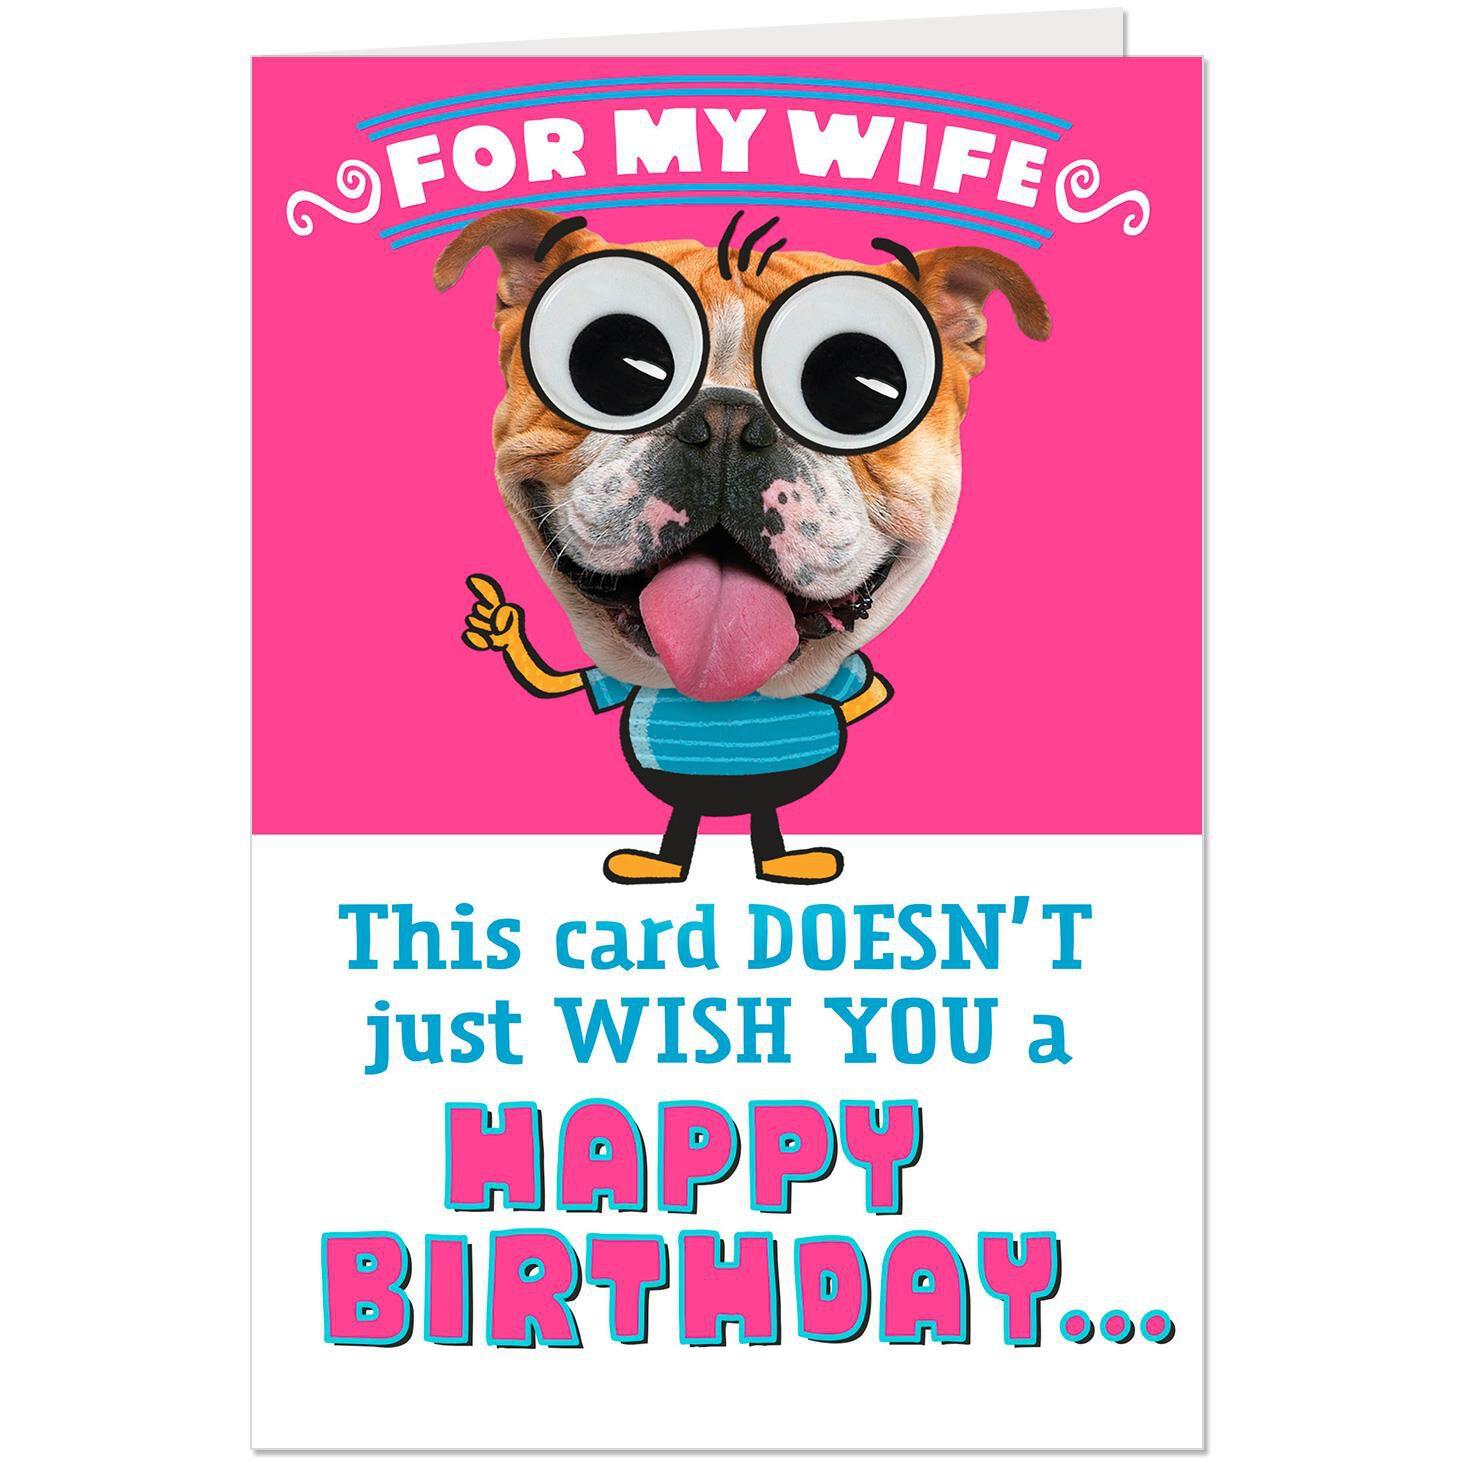 Googly Eyes Dog Funny Birthday Card For Wife